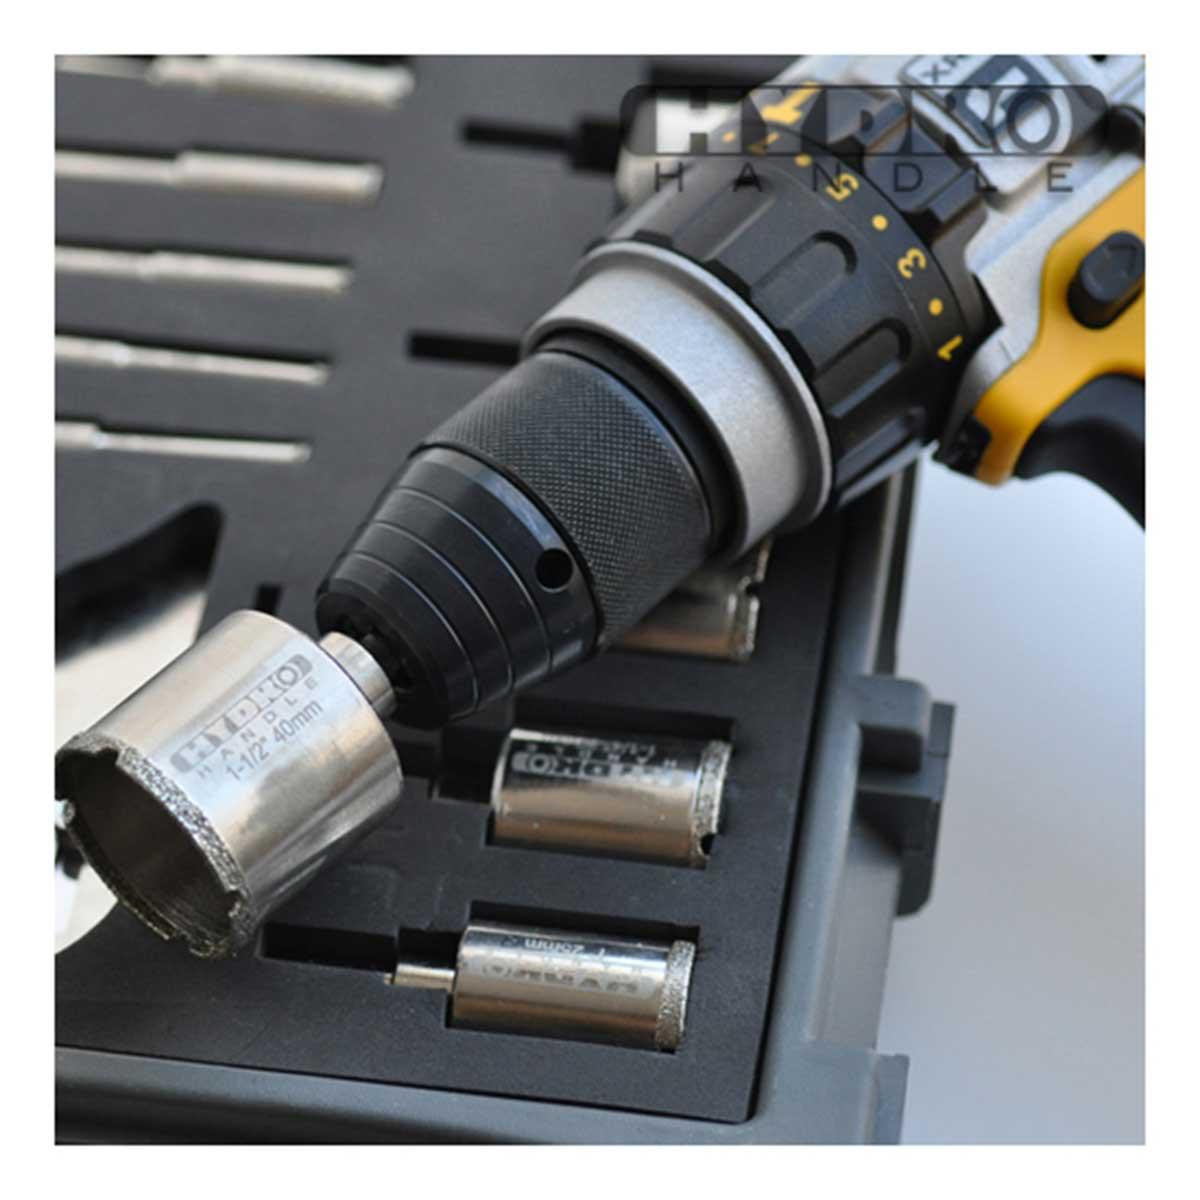 hydro handle bit on drill